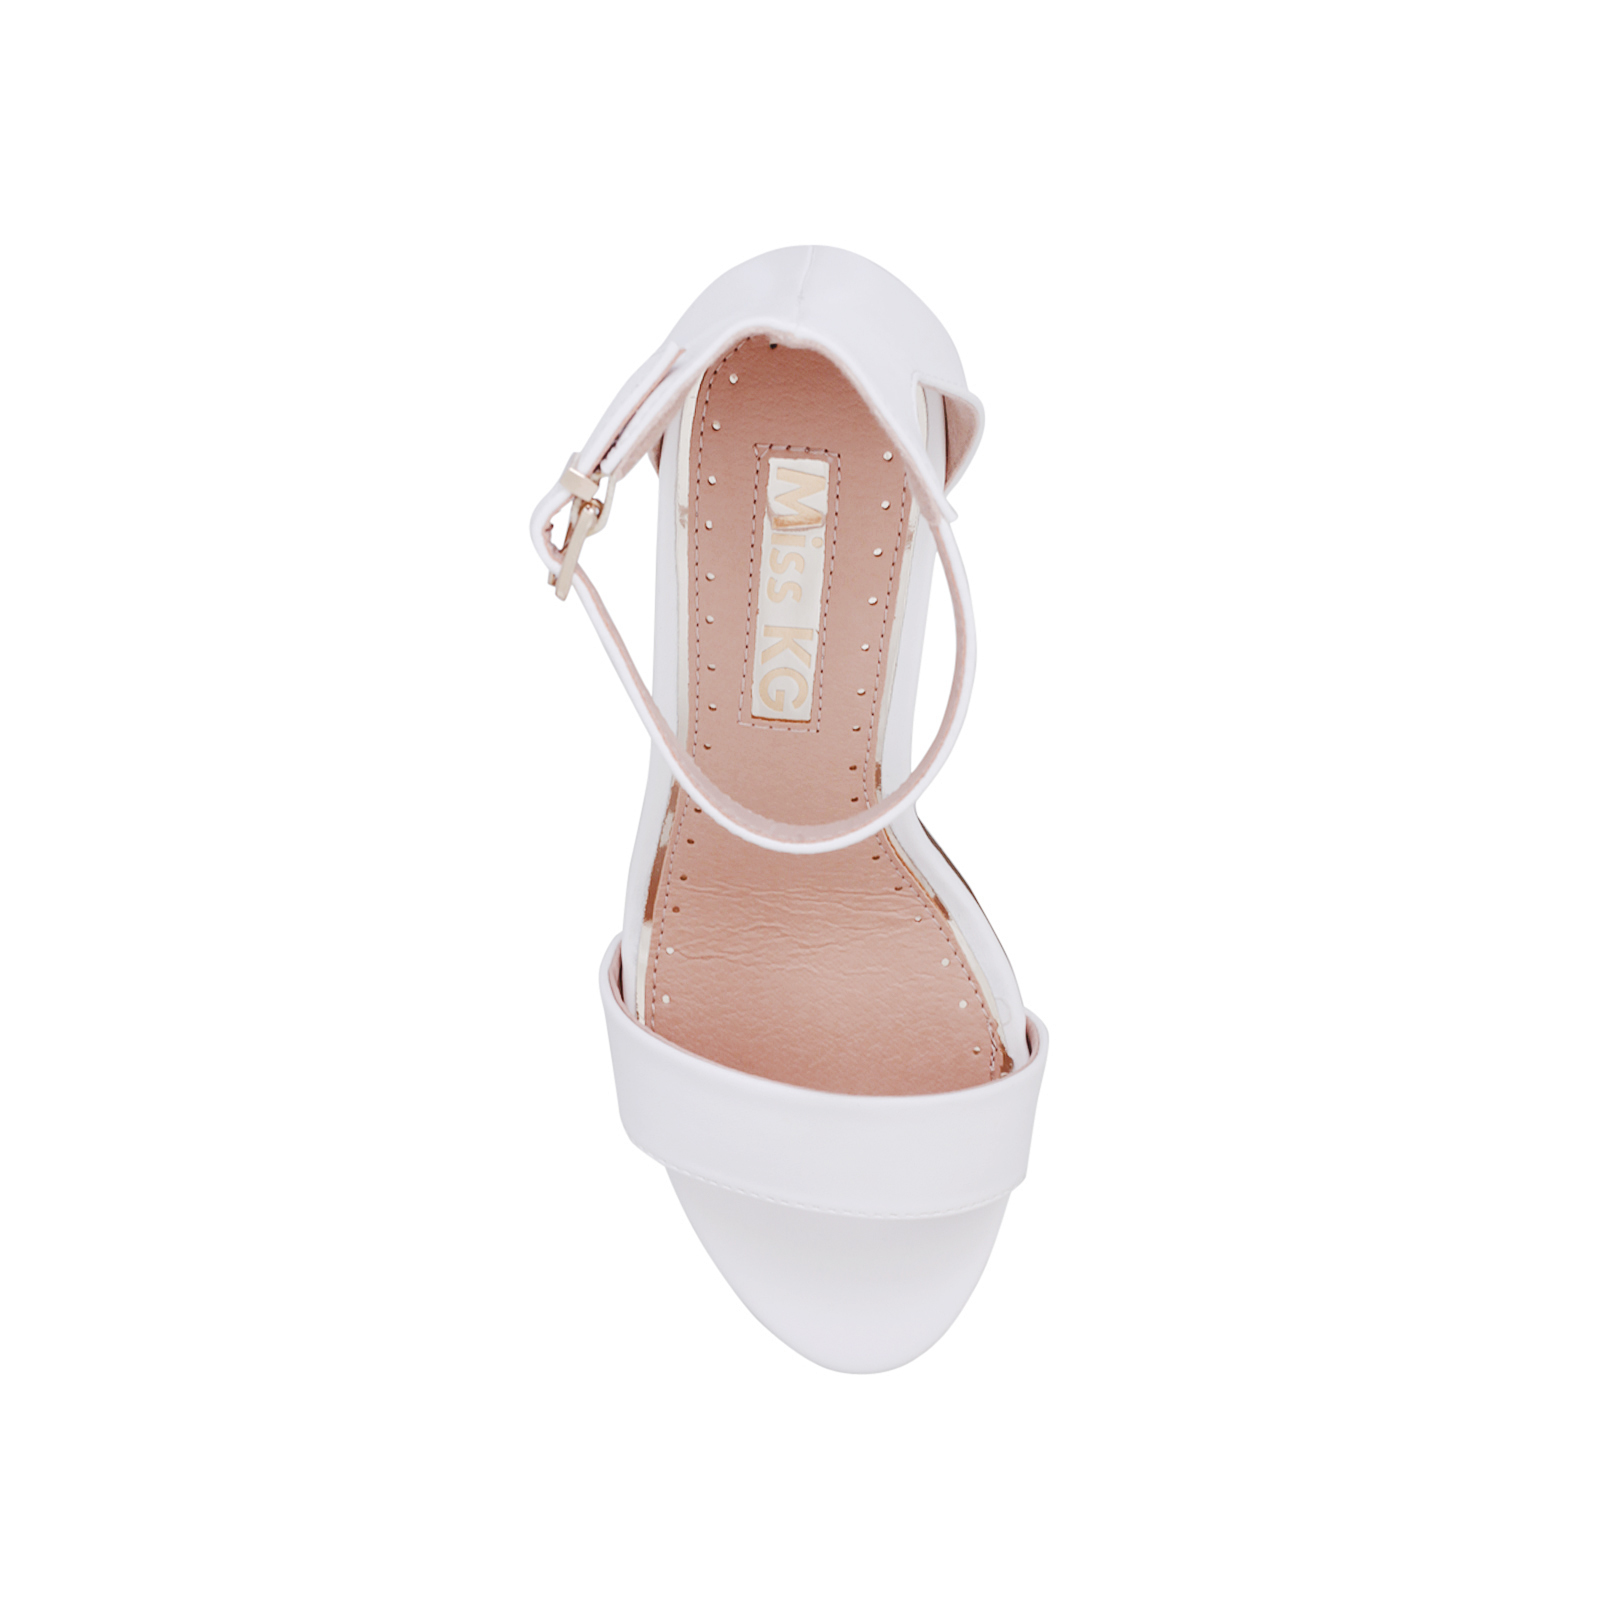 8e5c1b87c57 CADE Miss KG Cade Black High Heel Sandals Block Heel by MISS KG